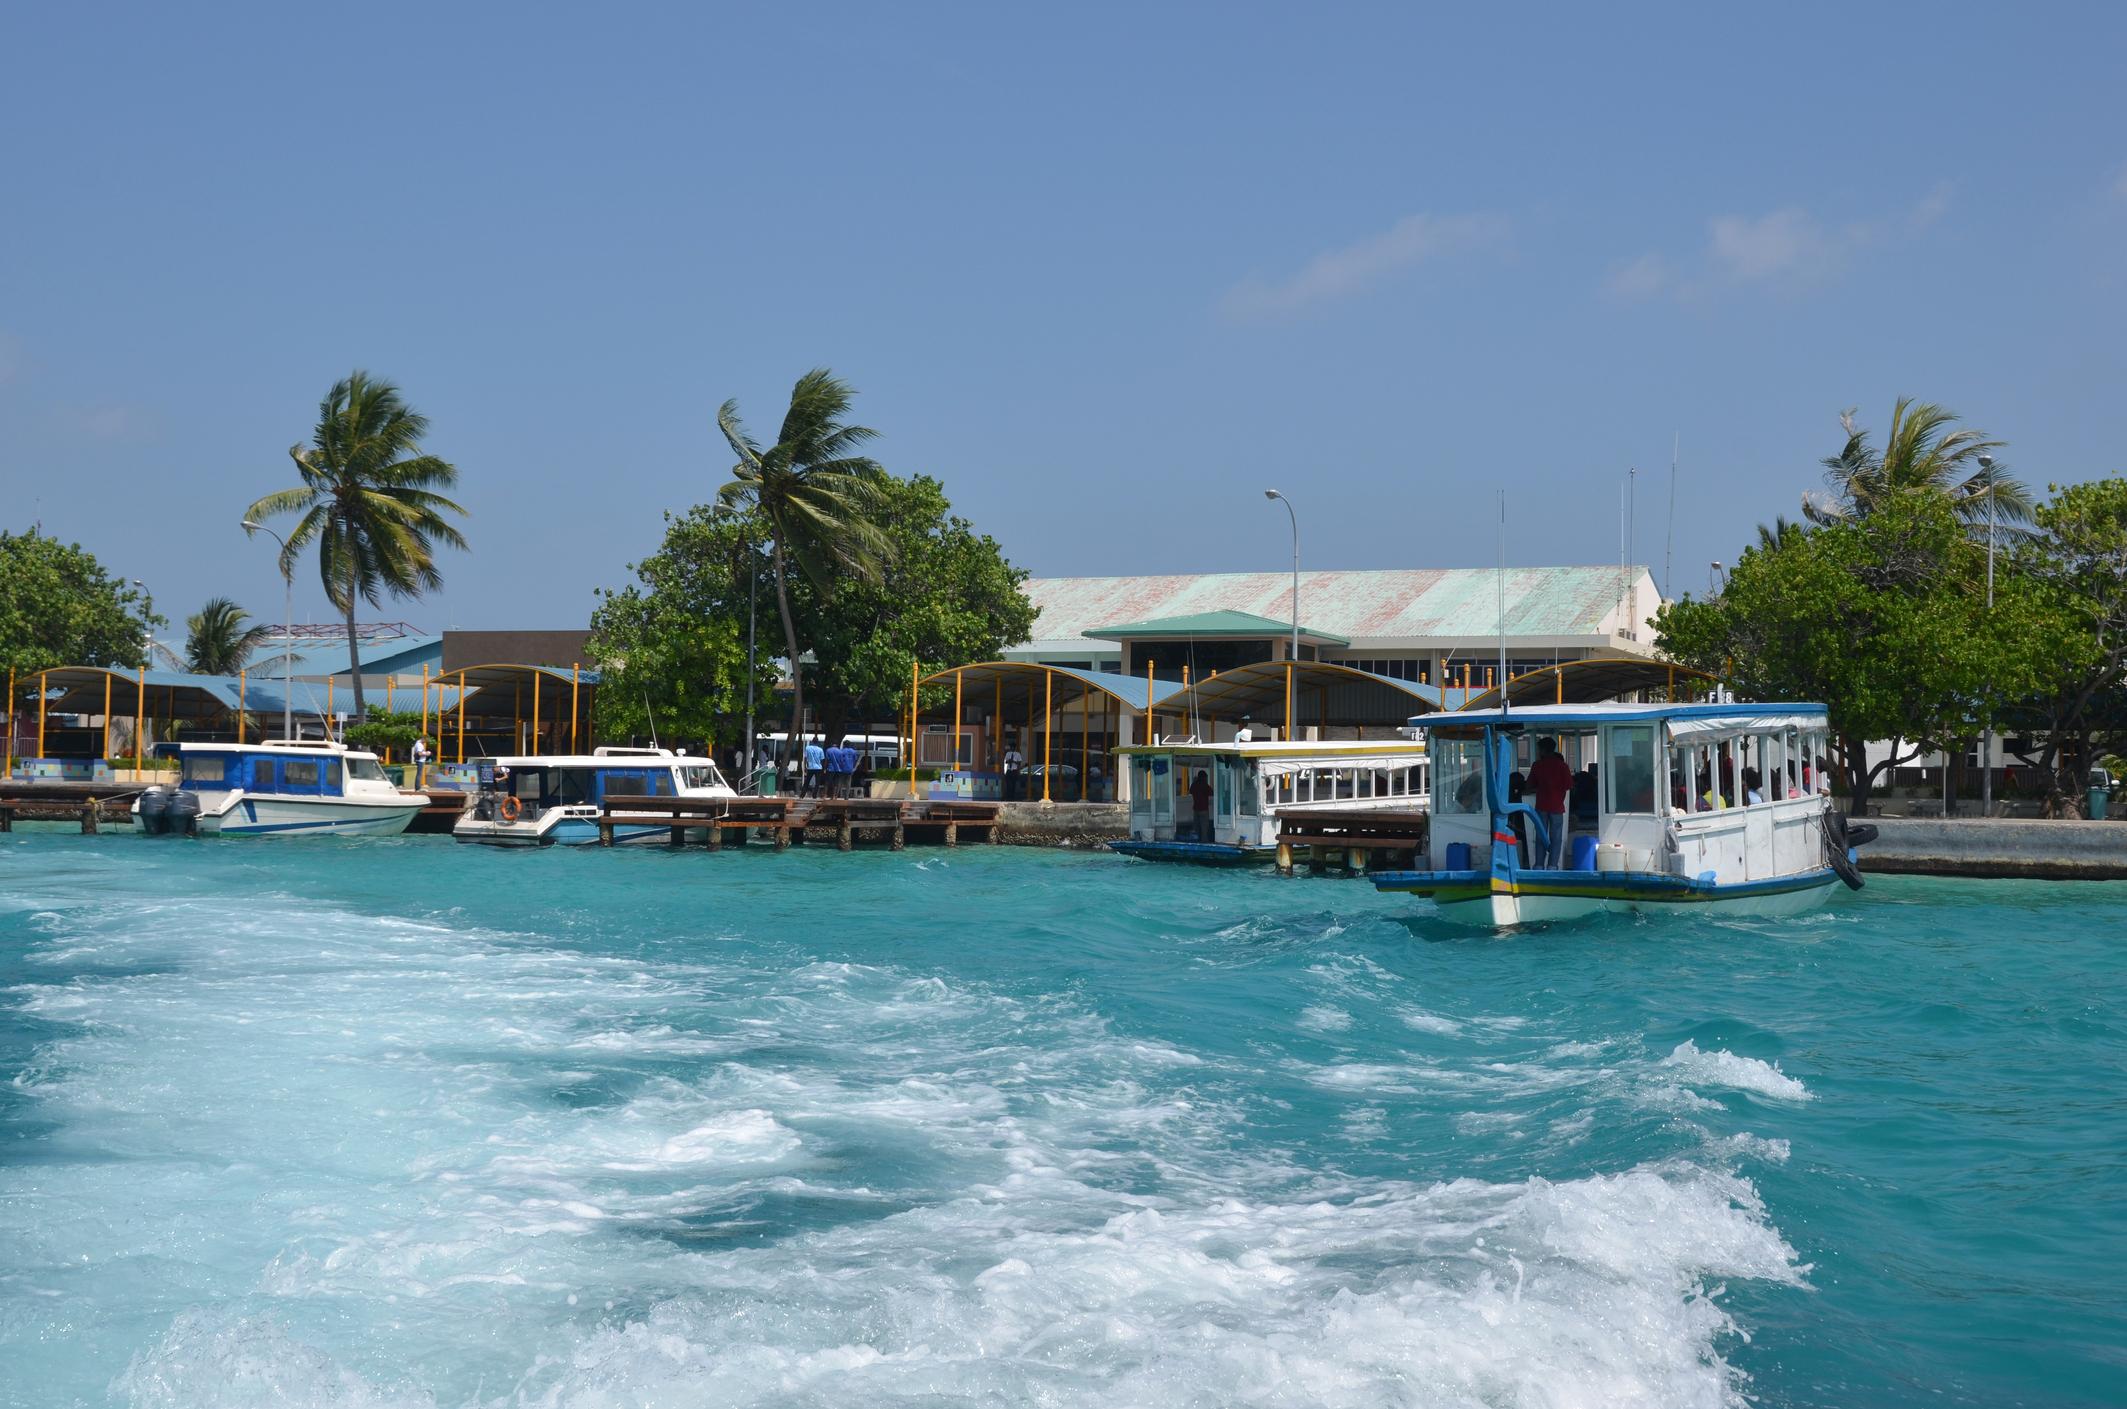 Dhonis (traditional Maldivian boats) at the Velana International Airport.